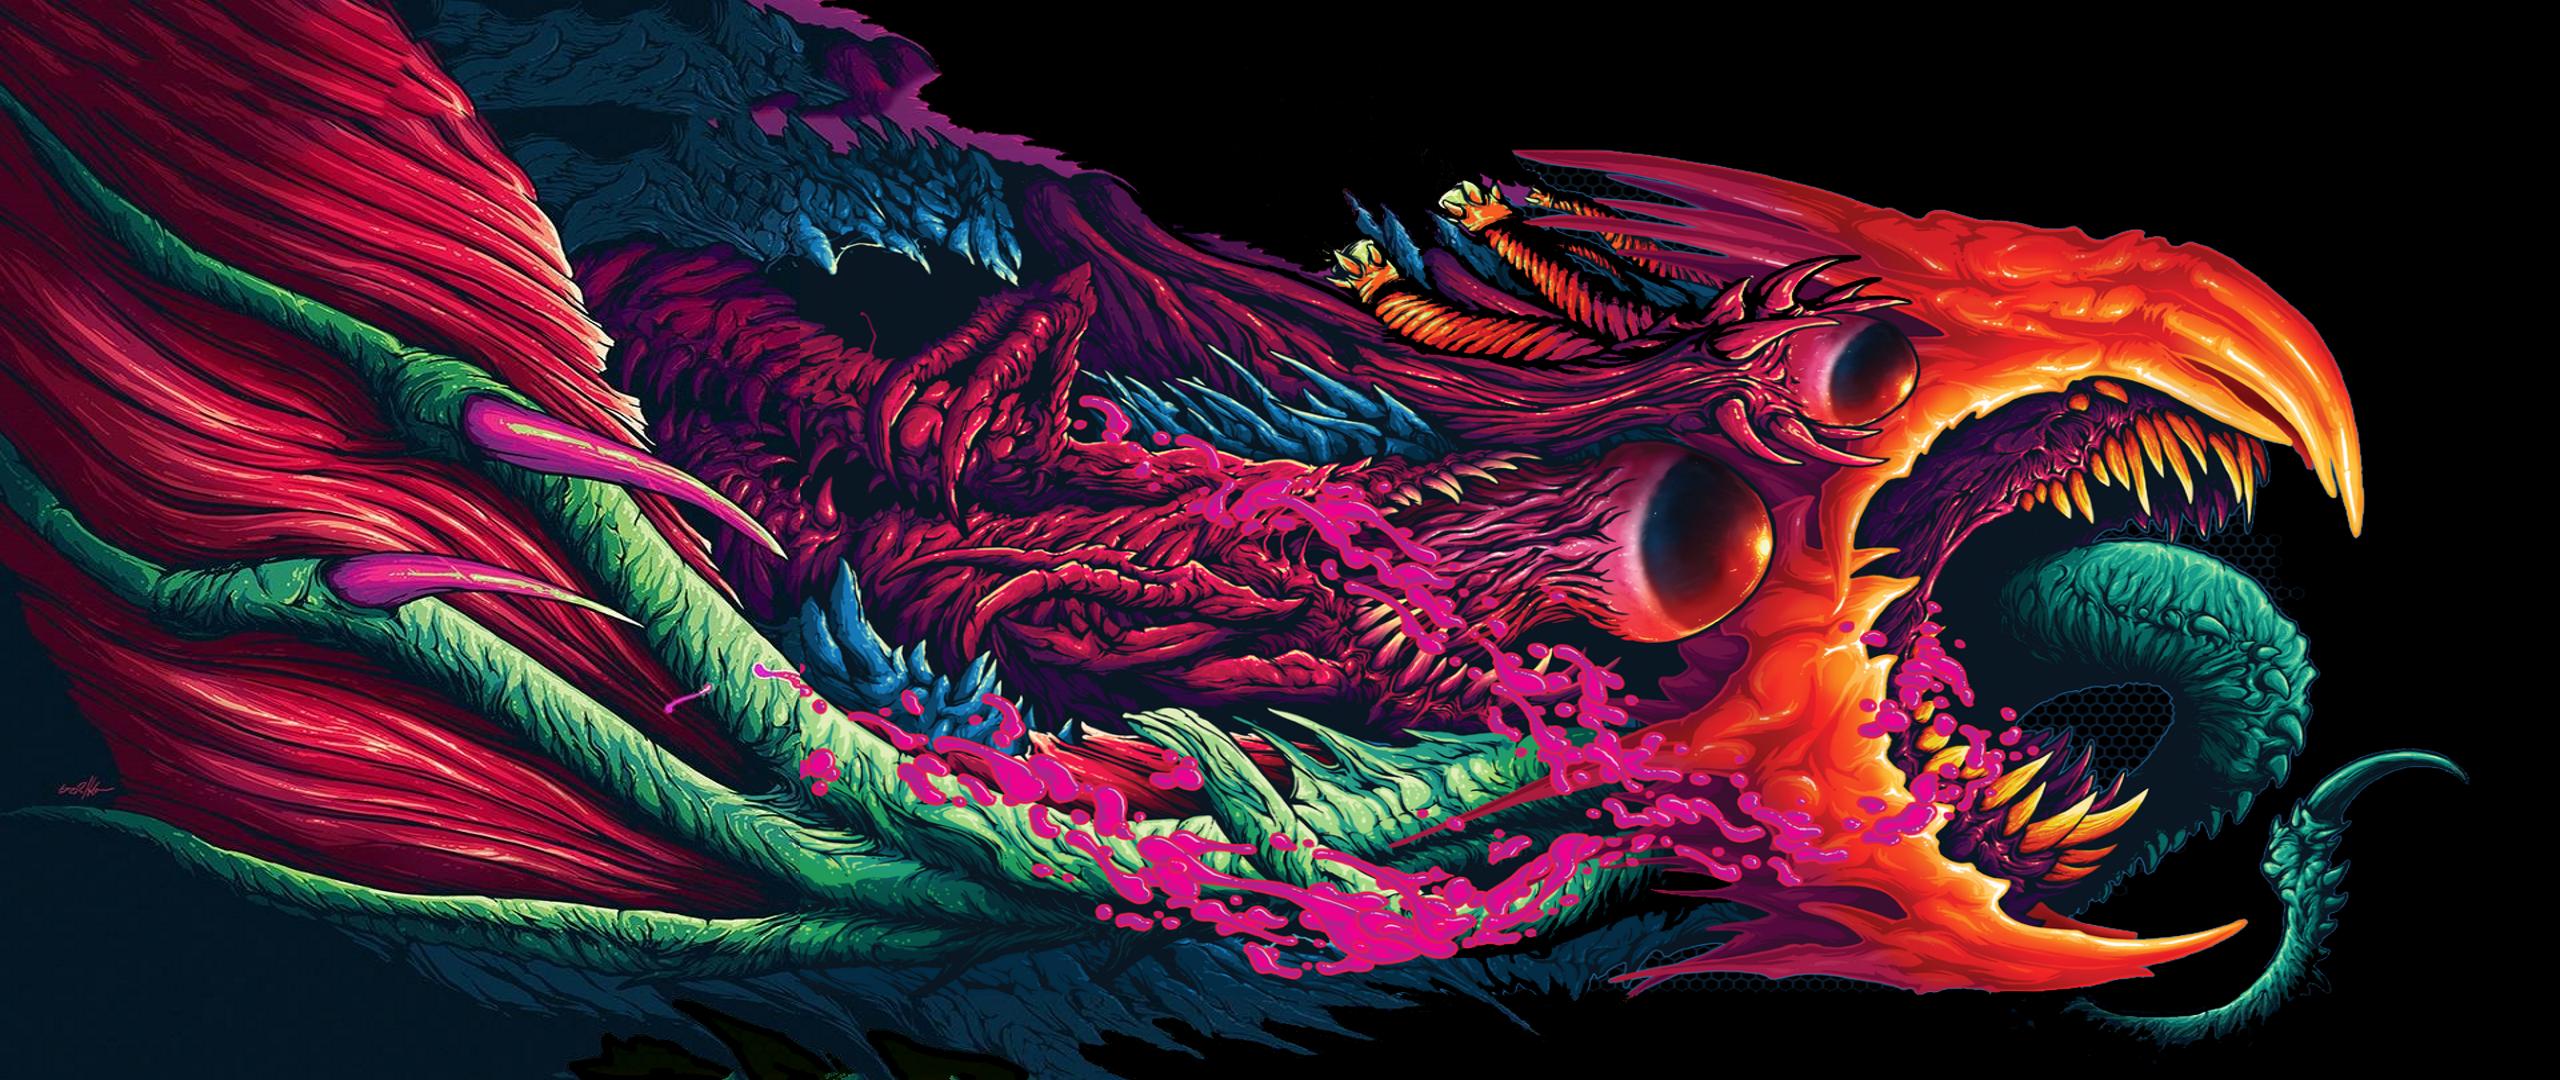 Hyper Beast Wallpaper 4k - 2560x1080 - Download HD ...